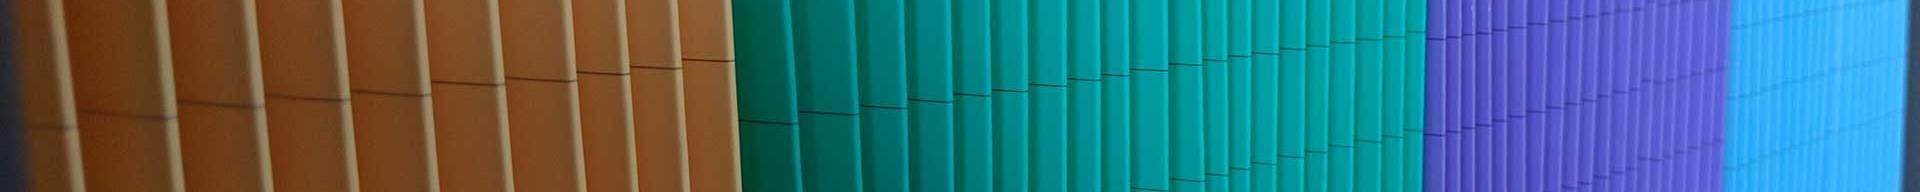 Ausrecord colour coded files